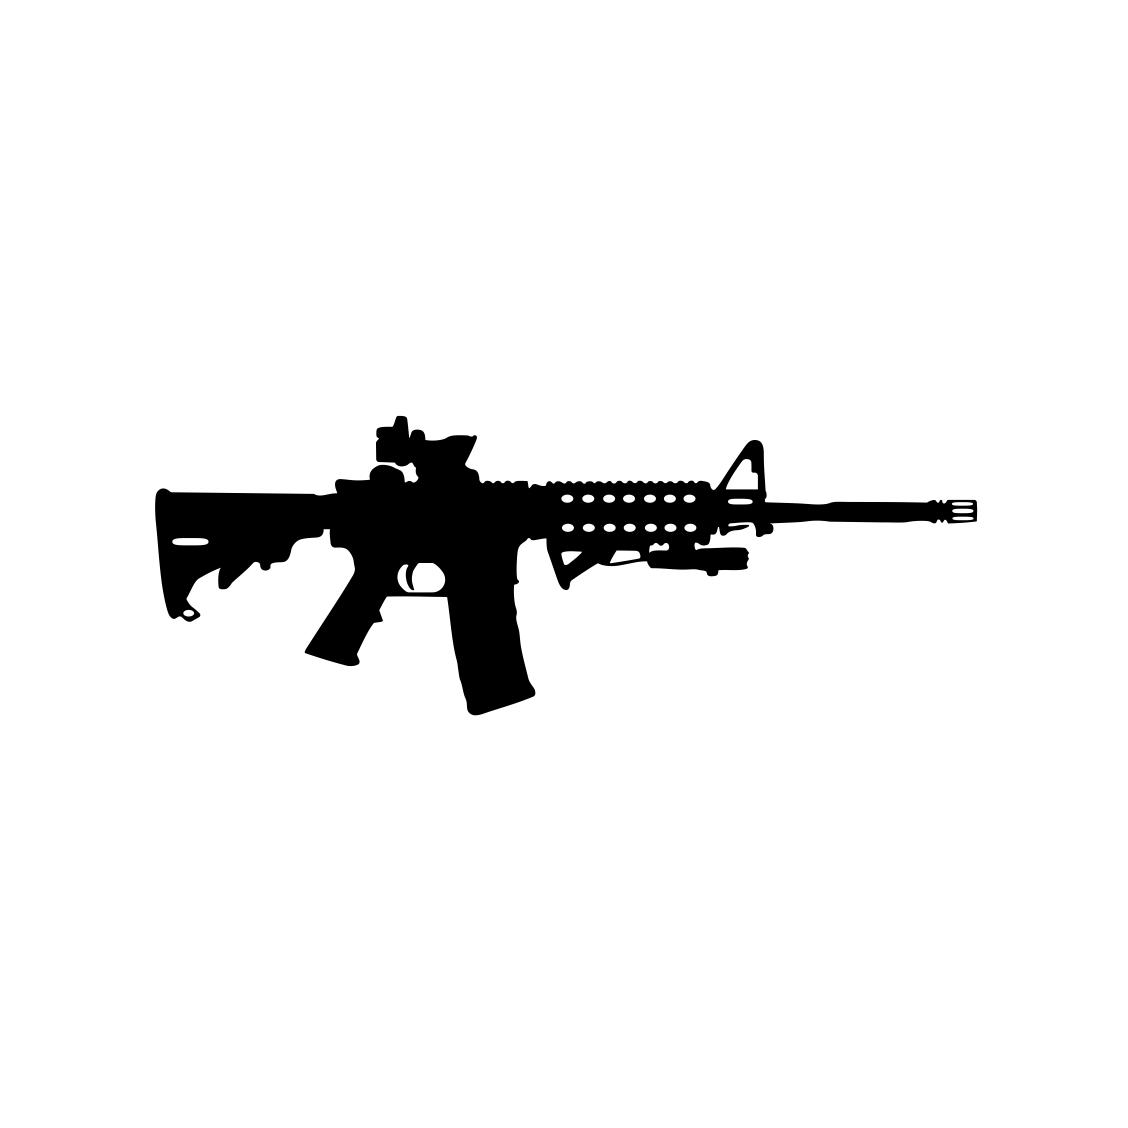 Ar 15 Gun Ammo Assault Rifle M16 Graphics By Vectordesign